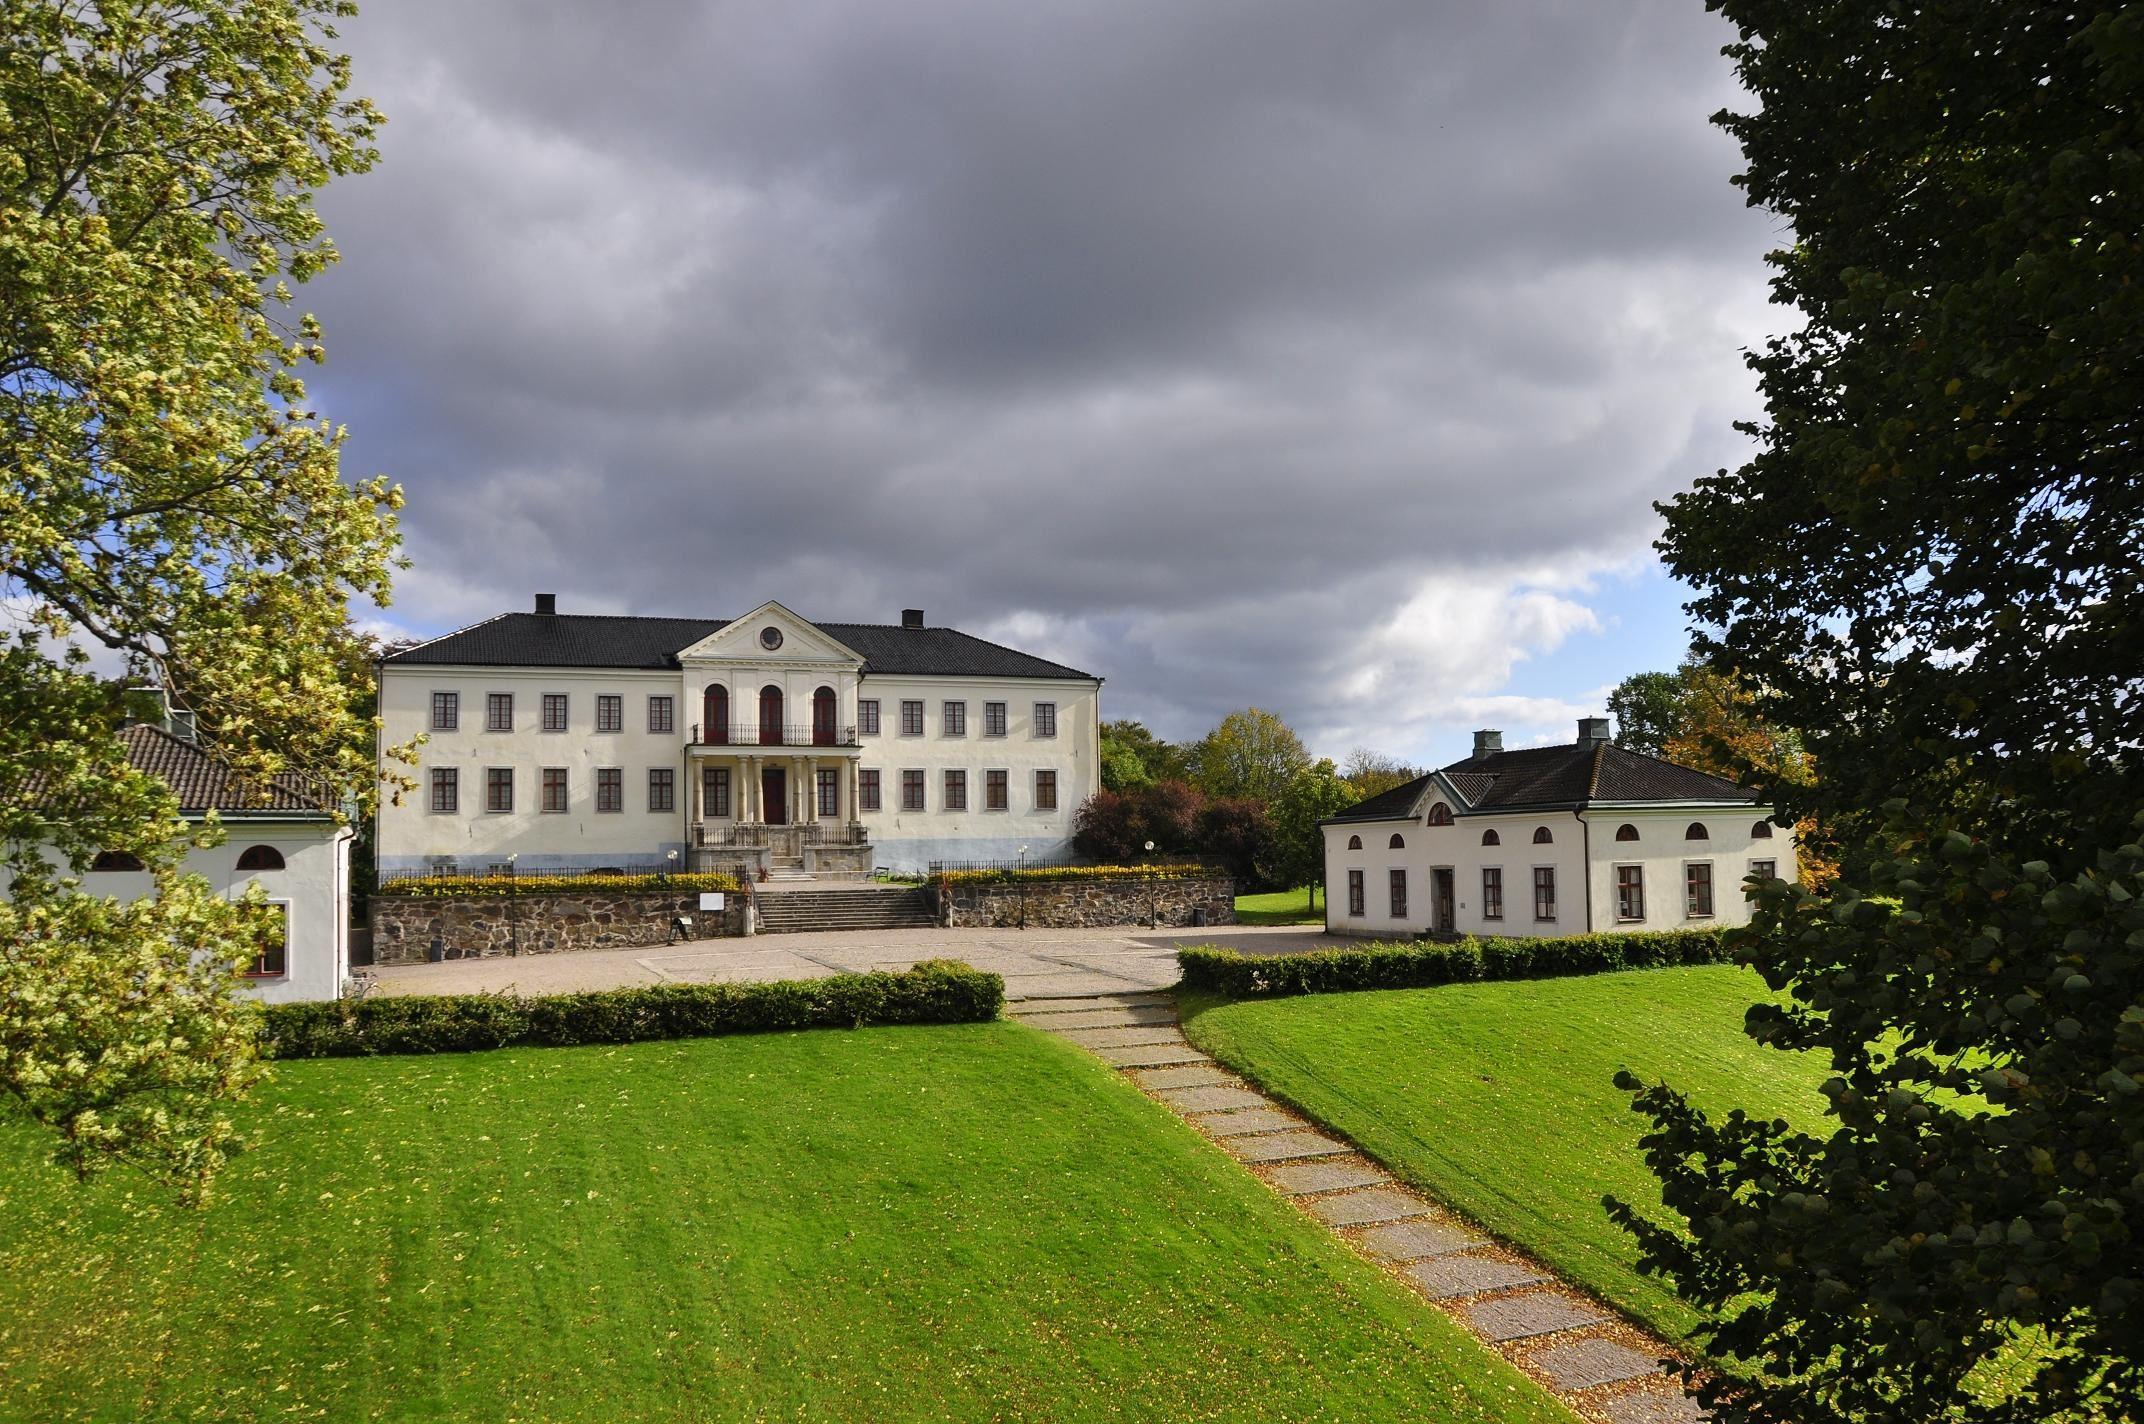 Nääs Slott, The north wing, Floda